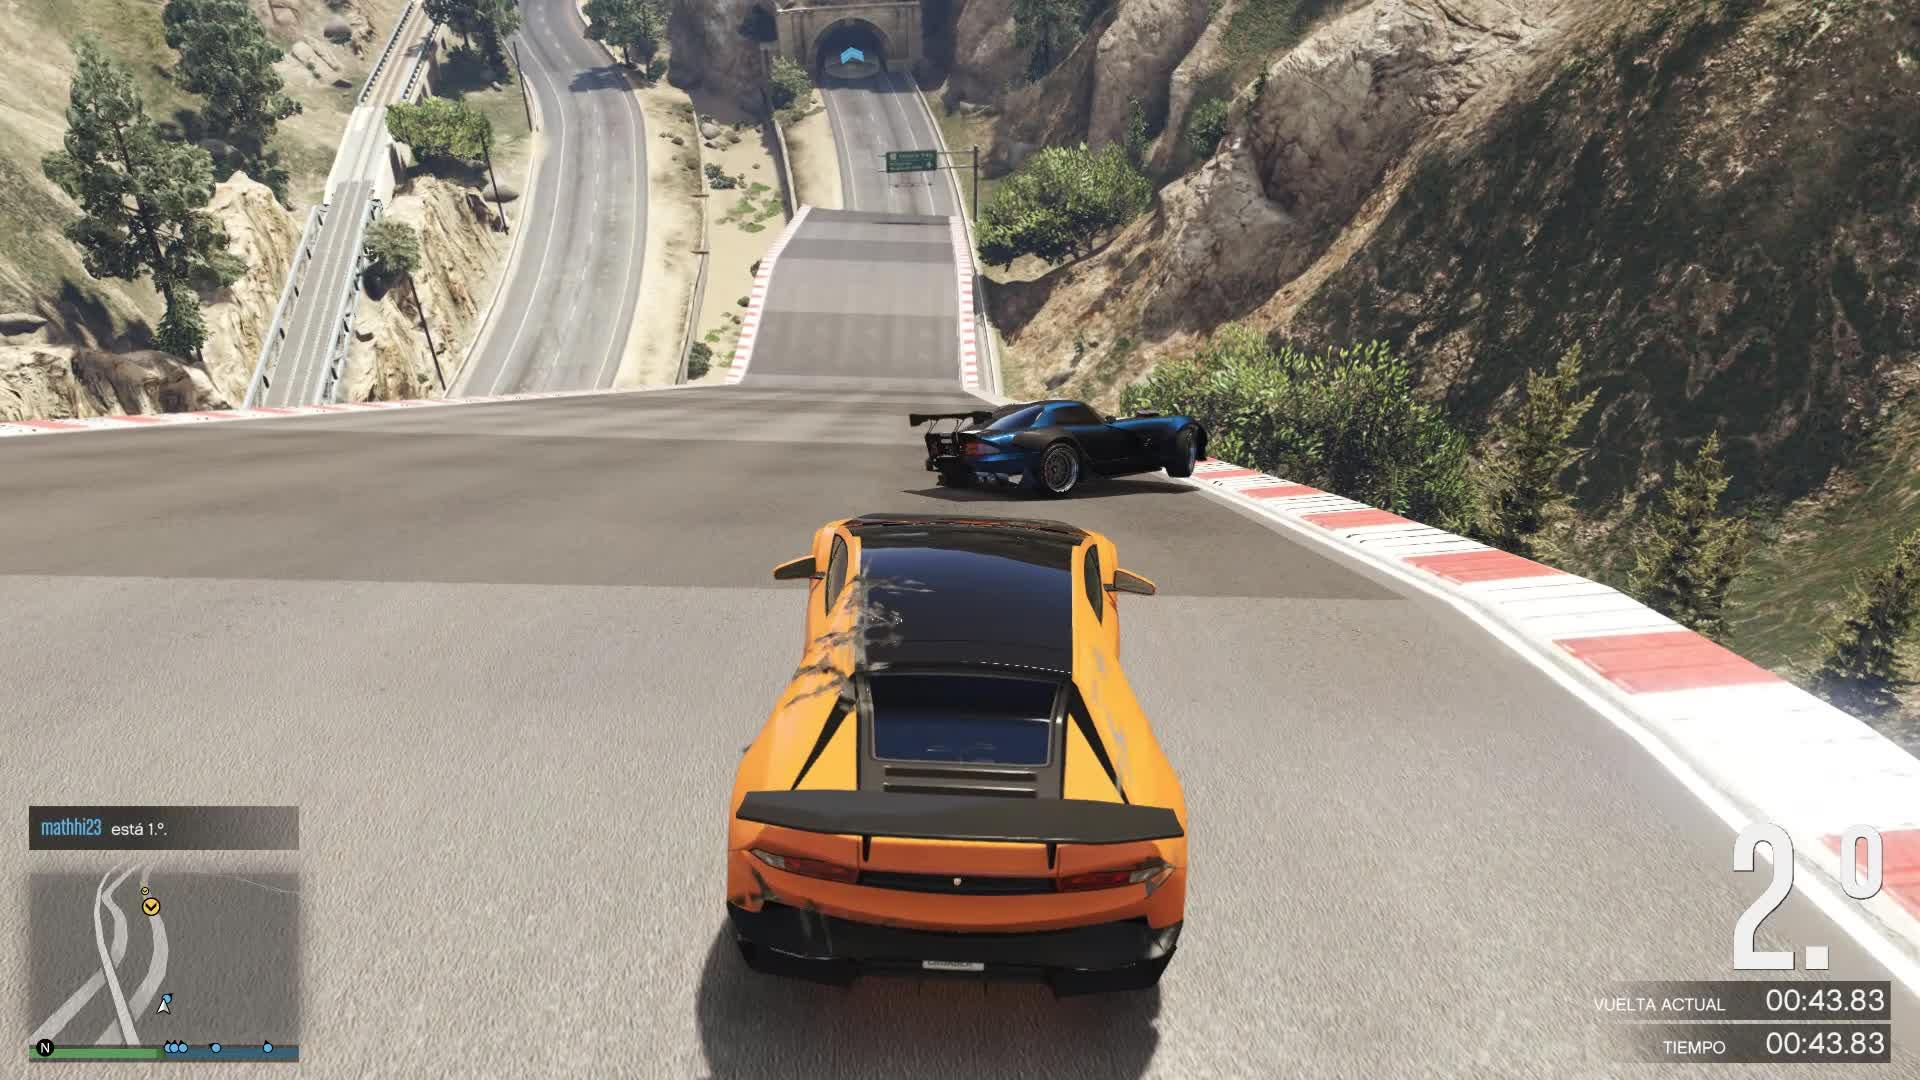 grandtheftautov, Grand Theft Auto V 2018.09.08 - 02.01.02.06.DVR GIFs